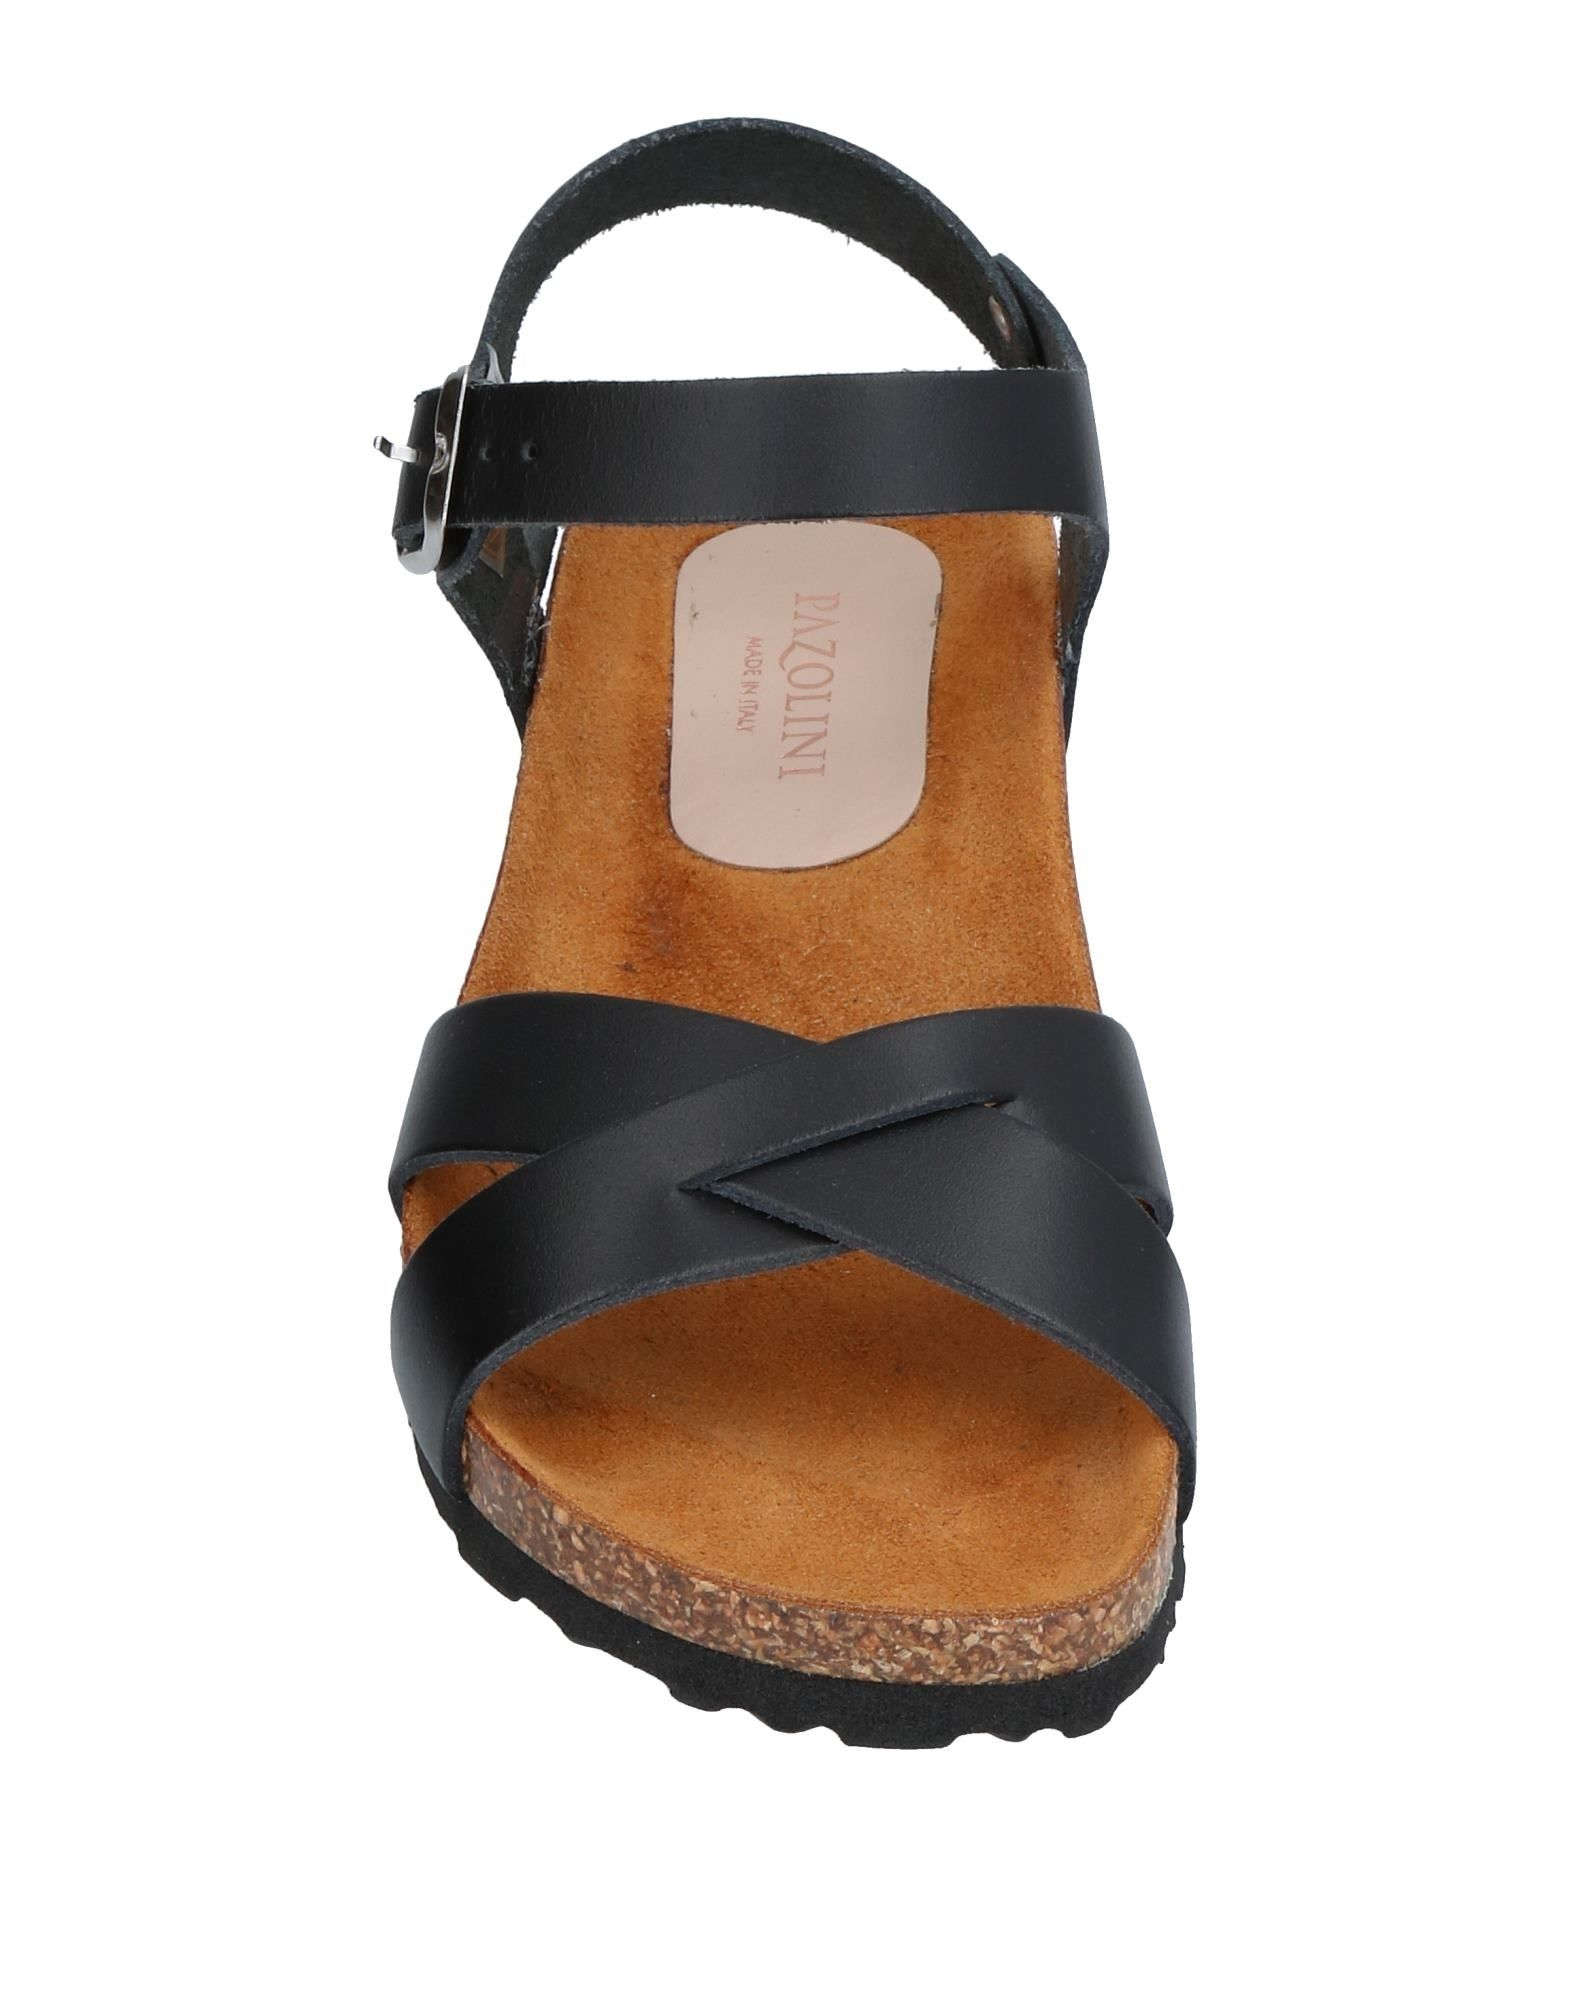 Chaussures - Tribunaux Carlo Pazolini wvuCTZ